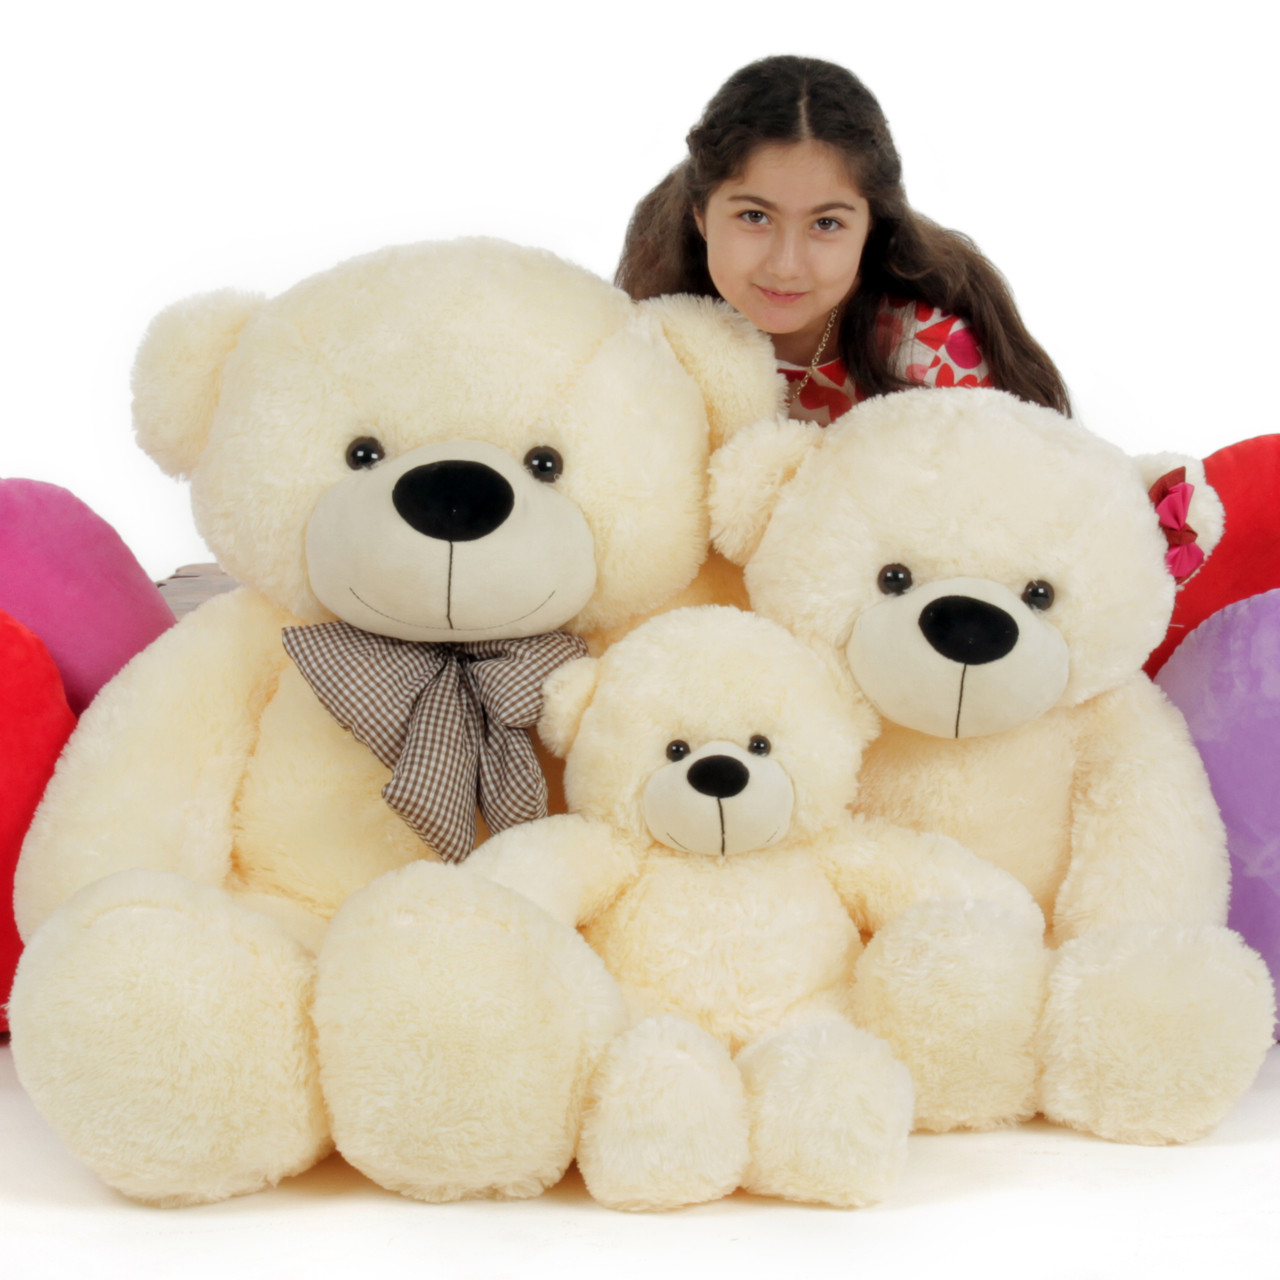 Huge Three Bear Family and Goldilocks, Giant Teddy Cozy Cuddles Family